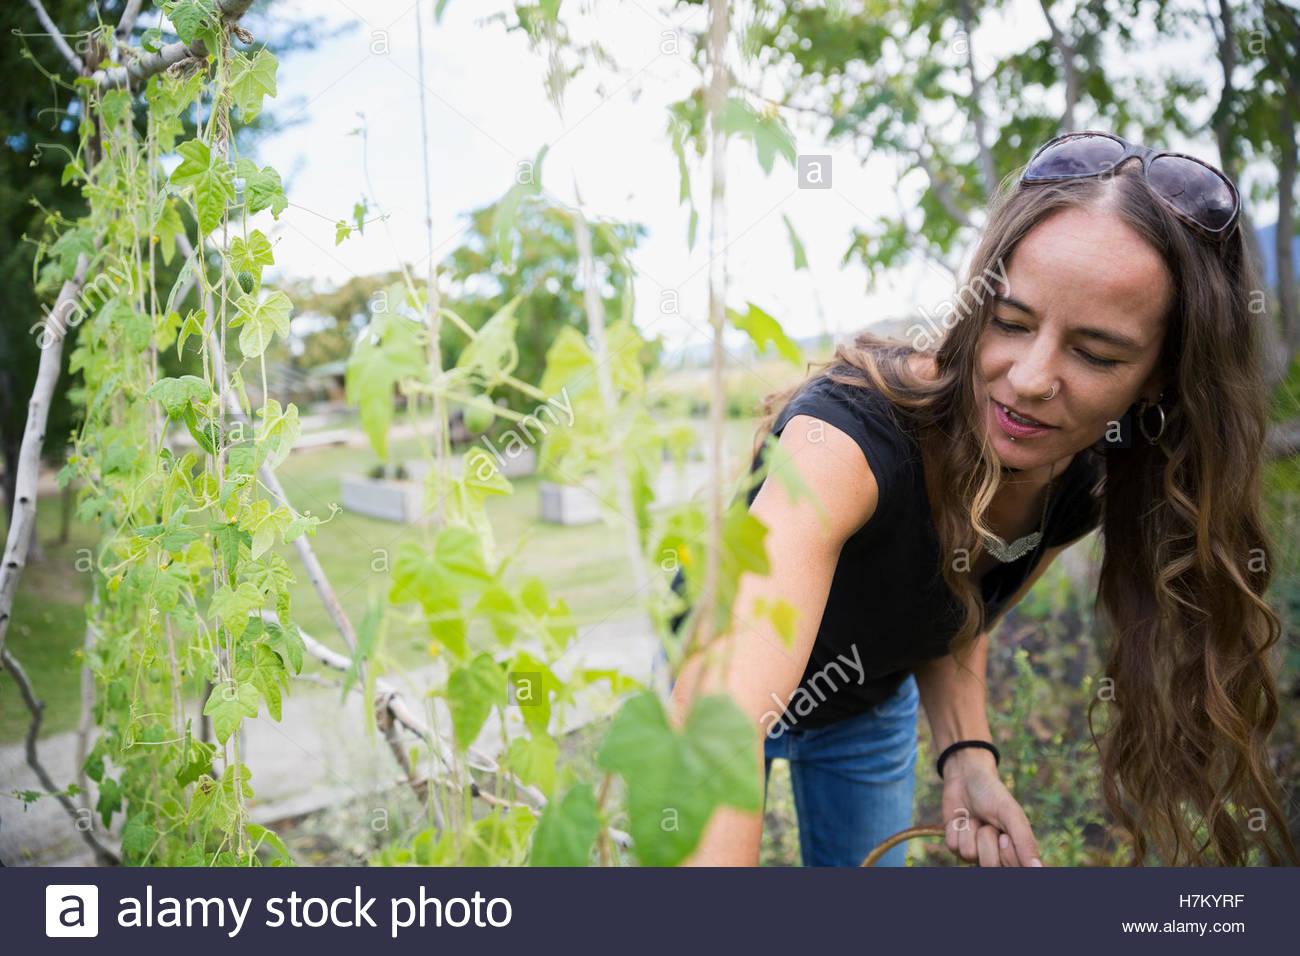 Woman gardening harvesting in vegetable garden - Stock Image